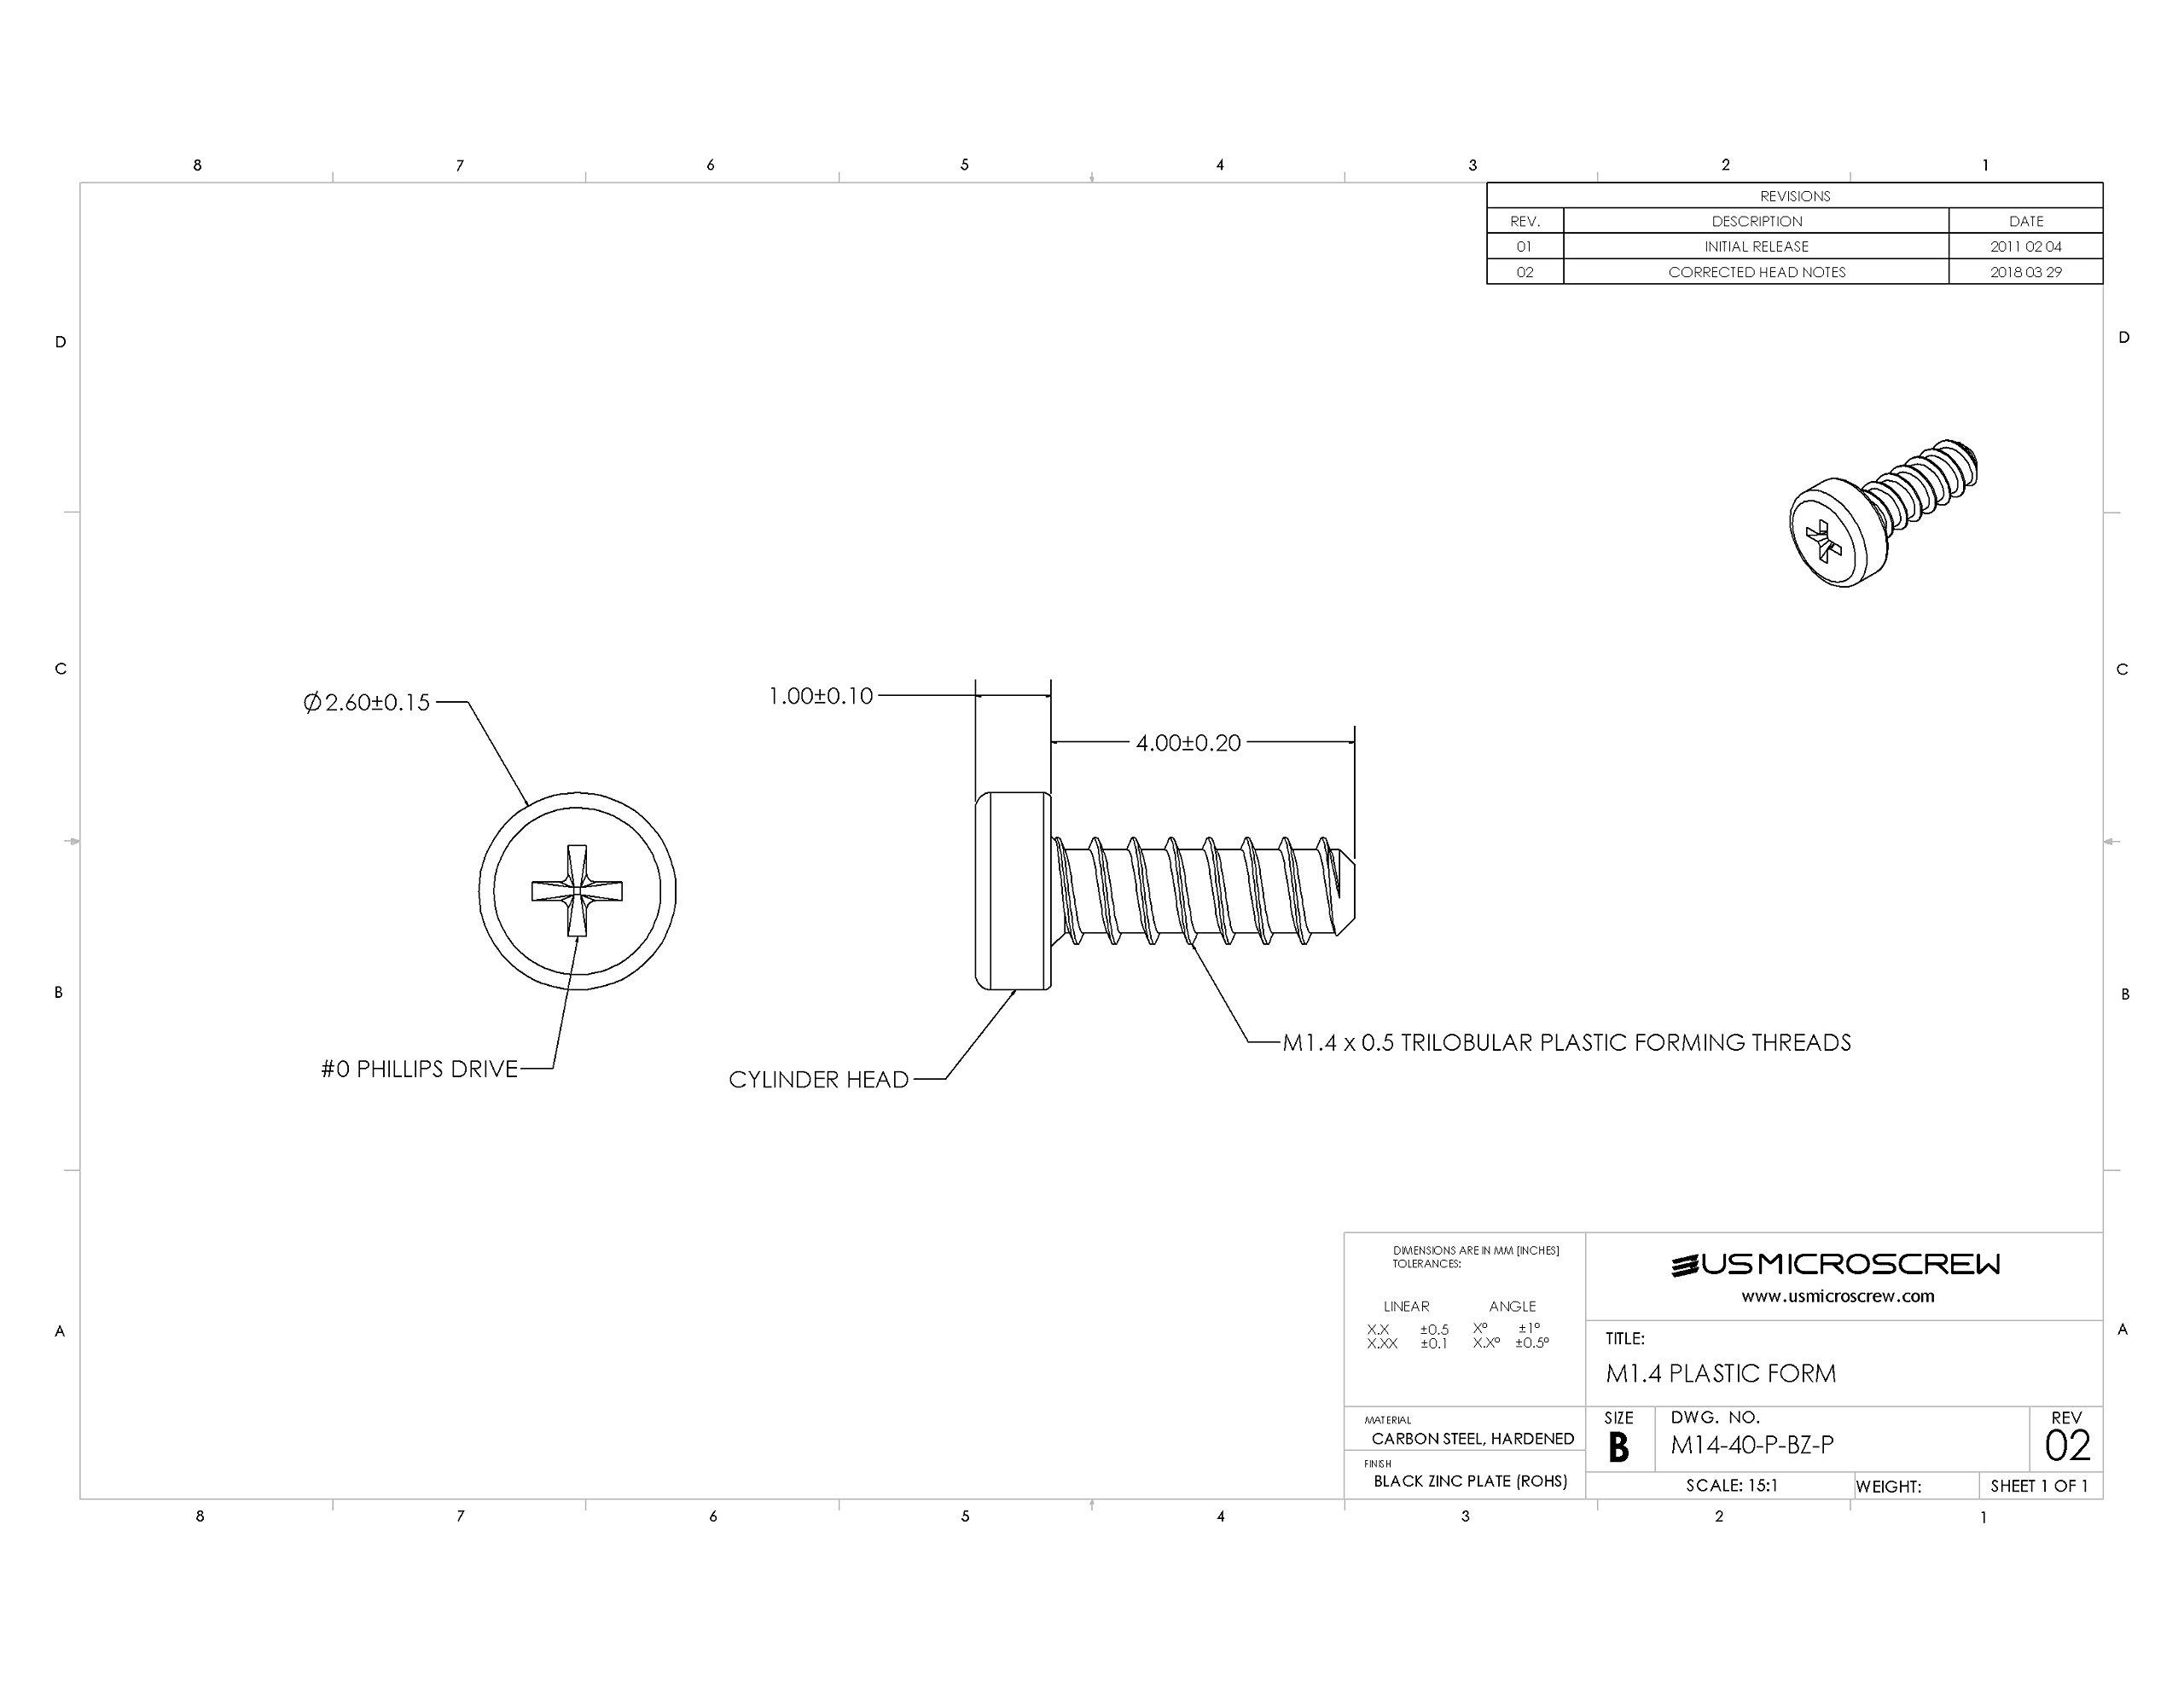 M1.4 X 4mm Plastic Thread Forming Screw Black Zinc Plated Steel Pan Head Phillips Drive (100 Pcs) - M14-40-P-BZ-P by US Micro Screw